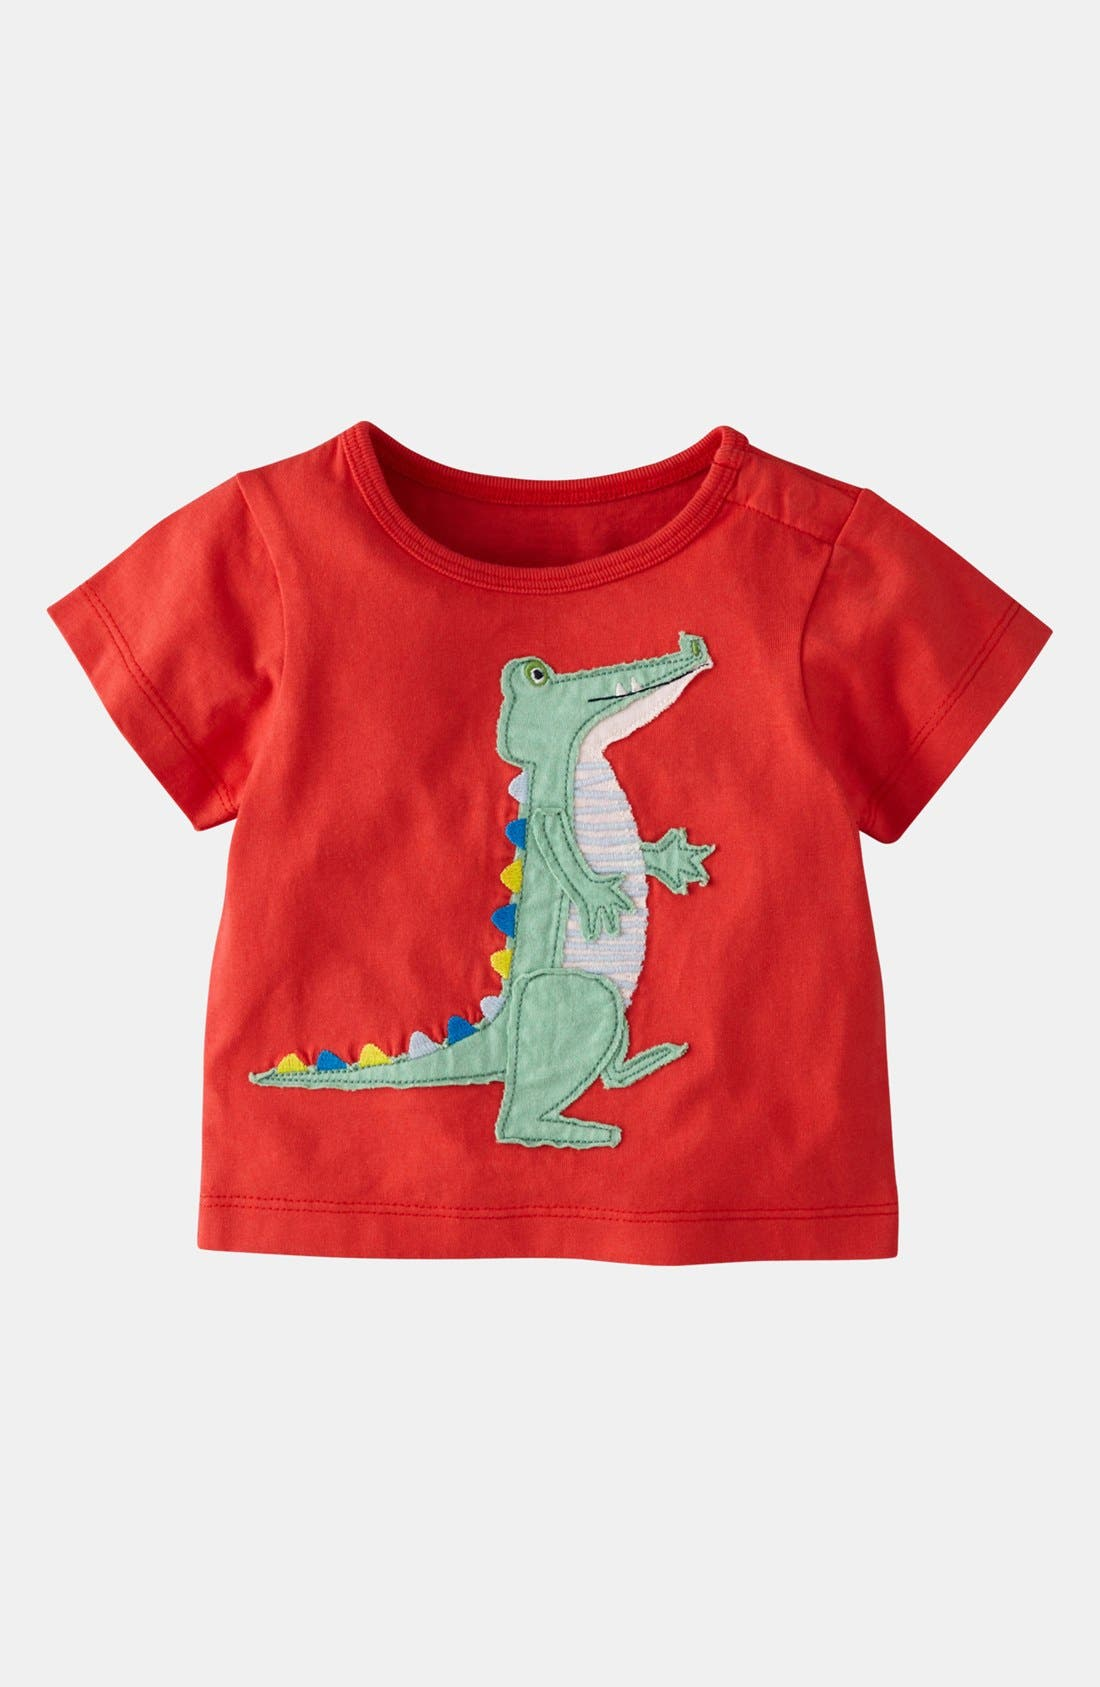 Alternate Image 1 Selected - Mini Boden 'Big Appliqué' T-Shirt (Baby)